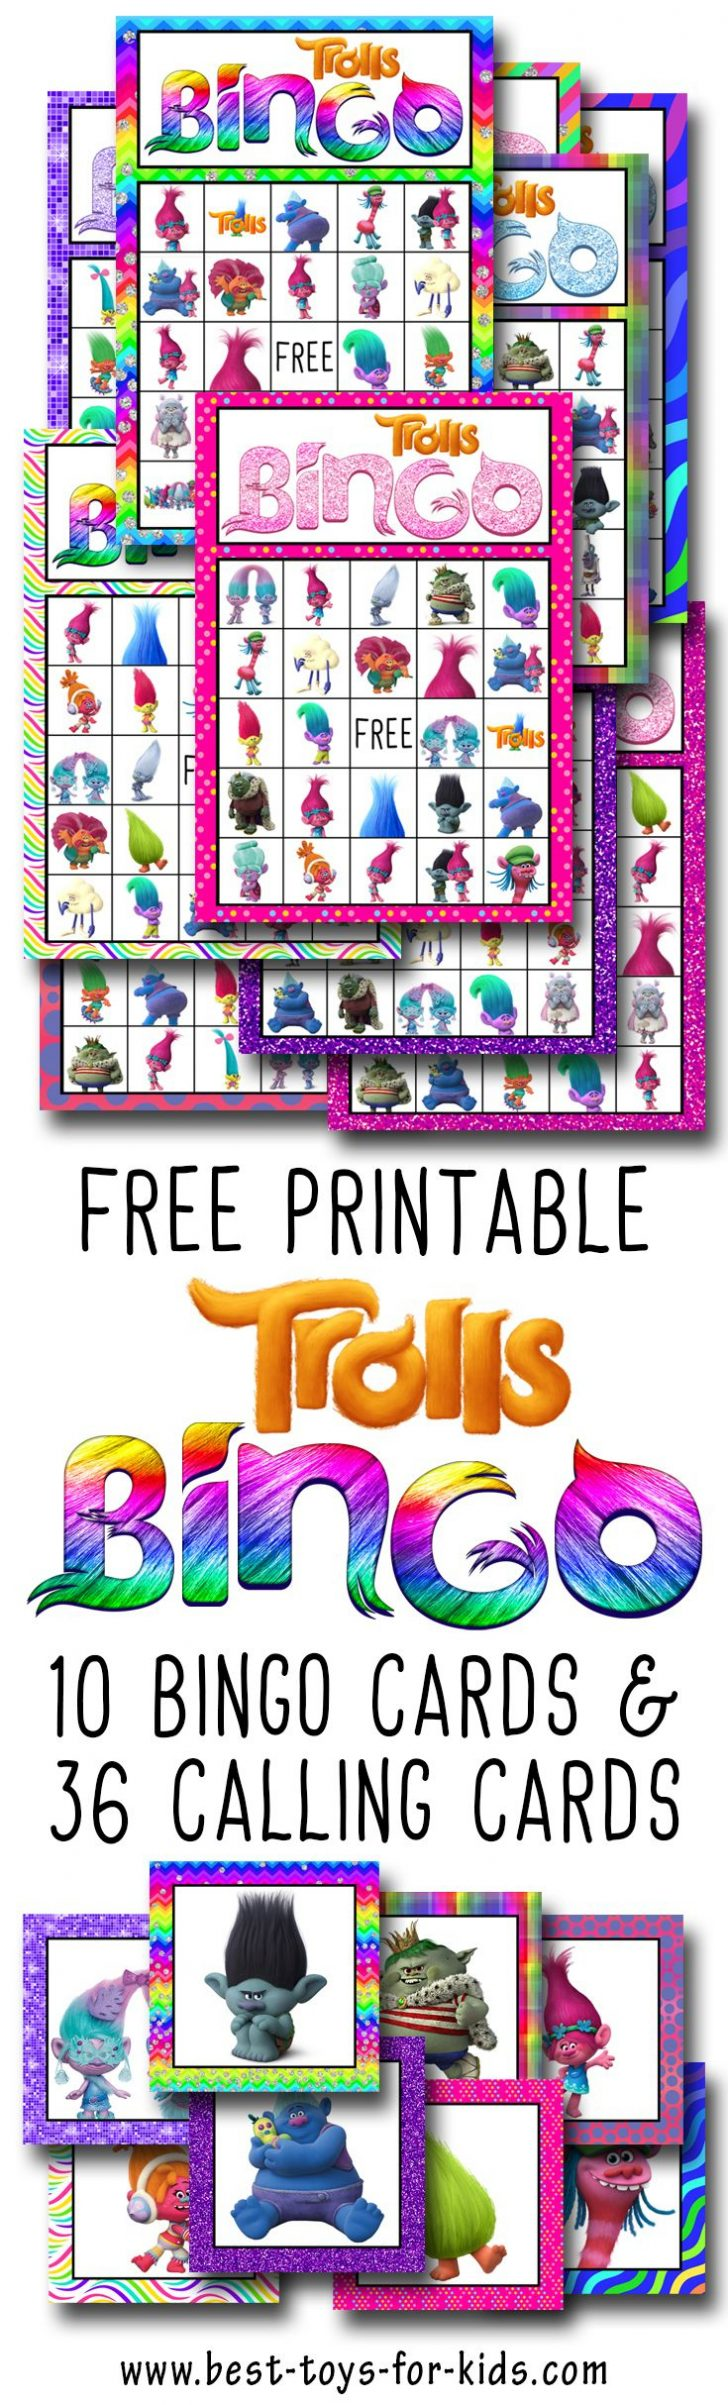 Free Printable Bingo Cards Birthday Party